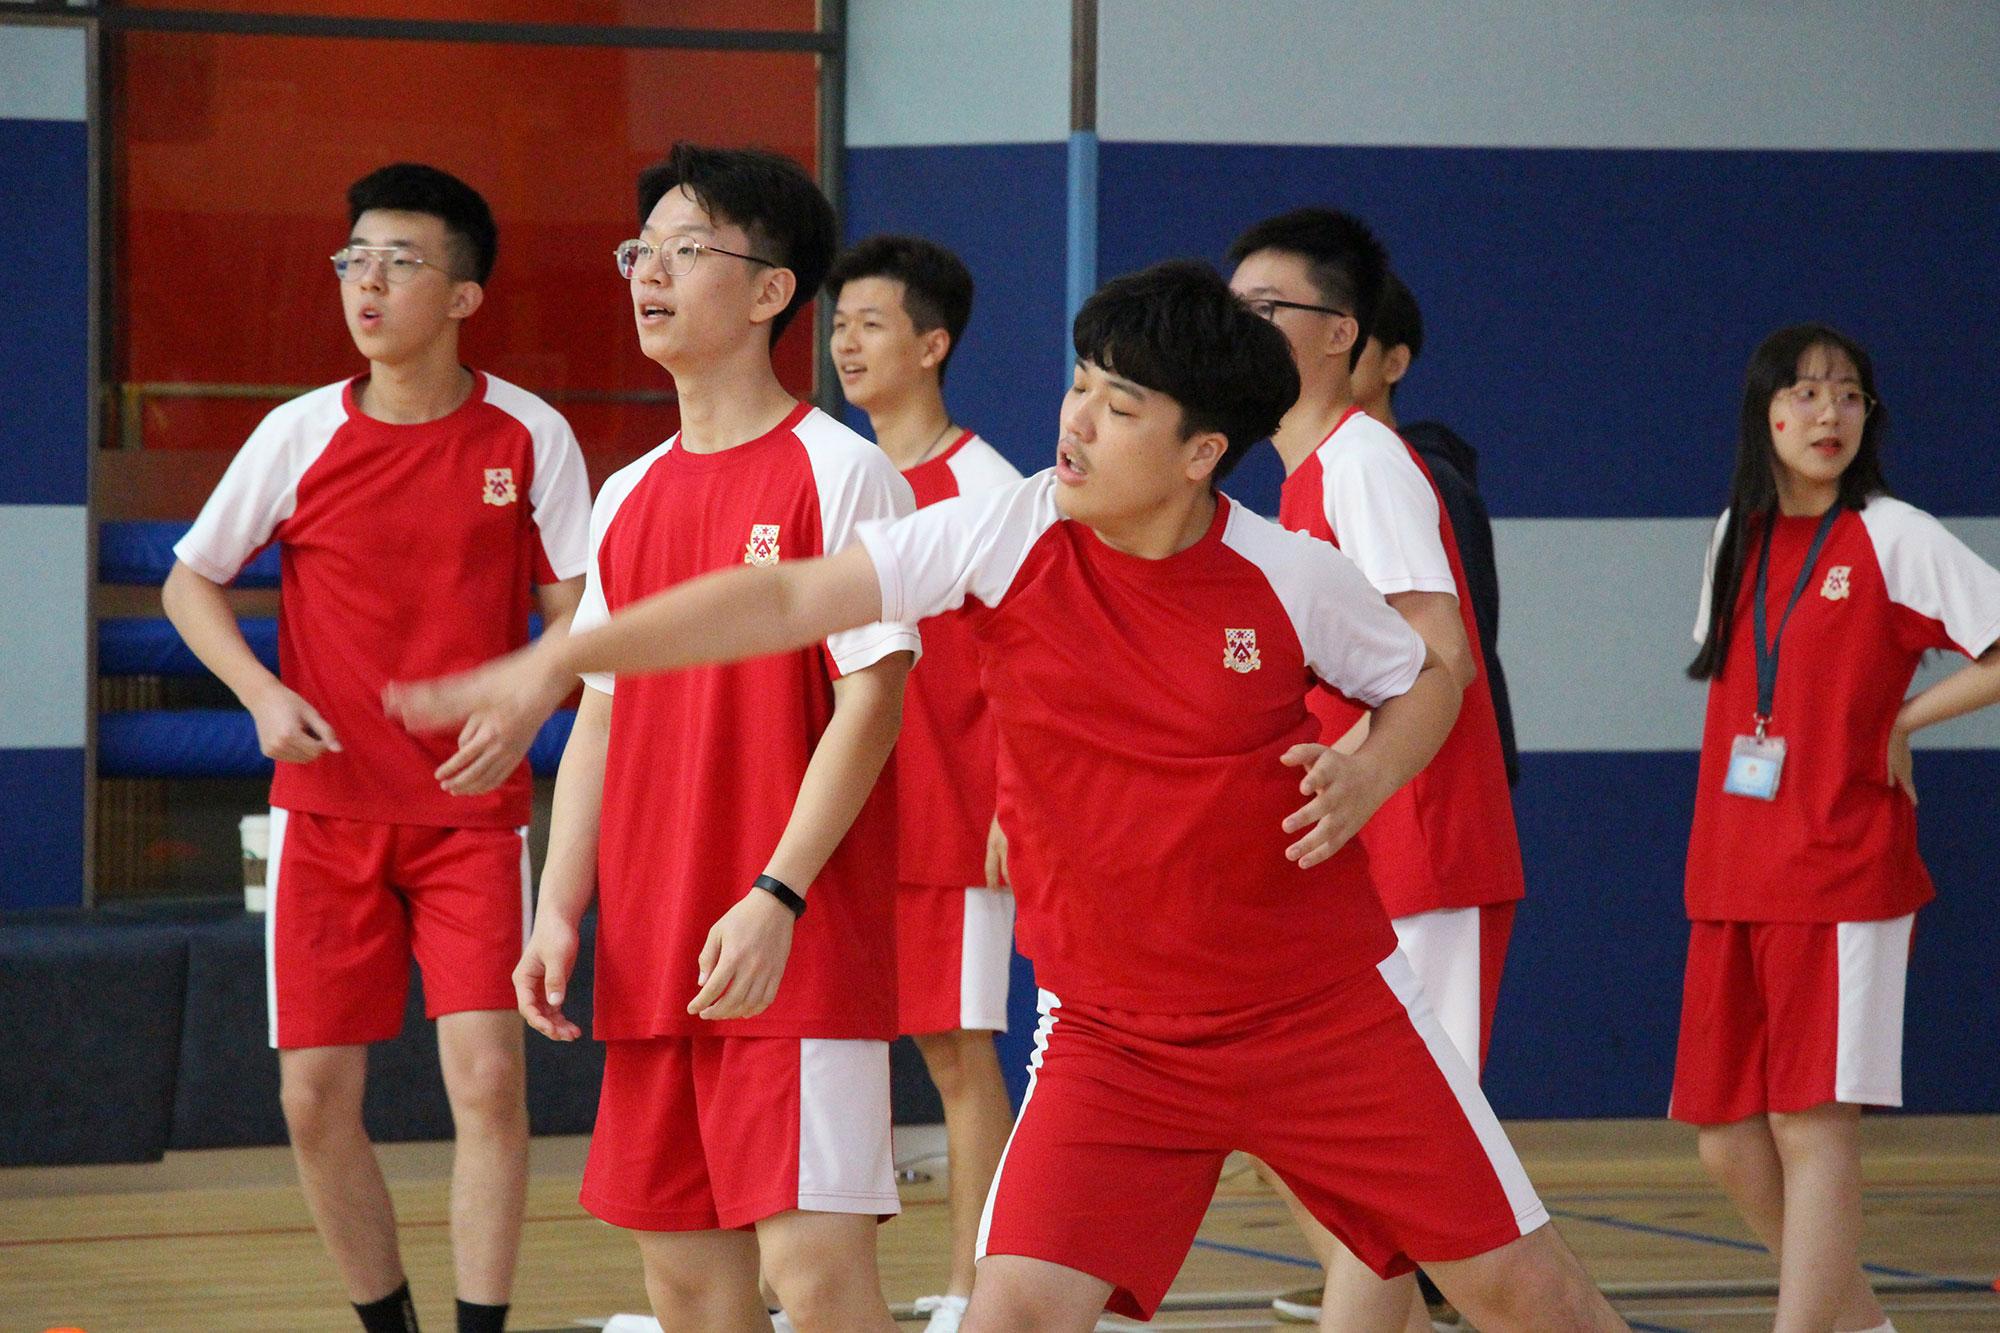 001-dodge-ball-Dulwich_International_High_School_Suzhou